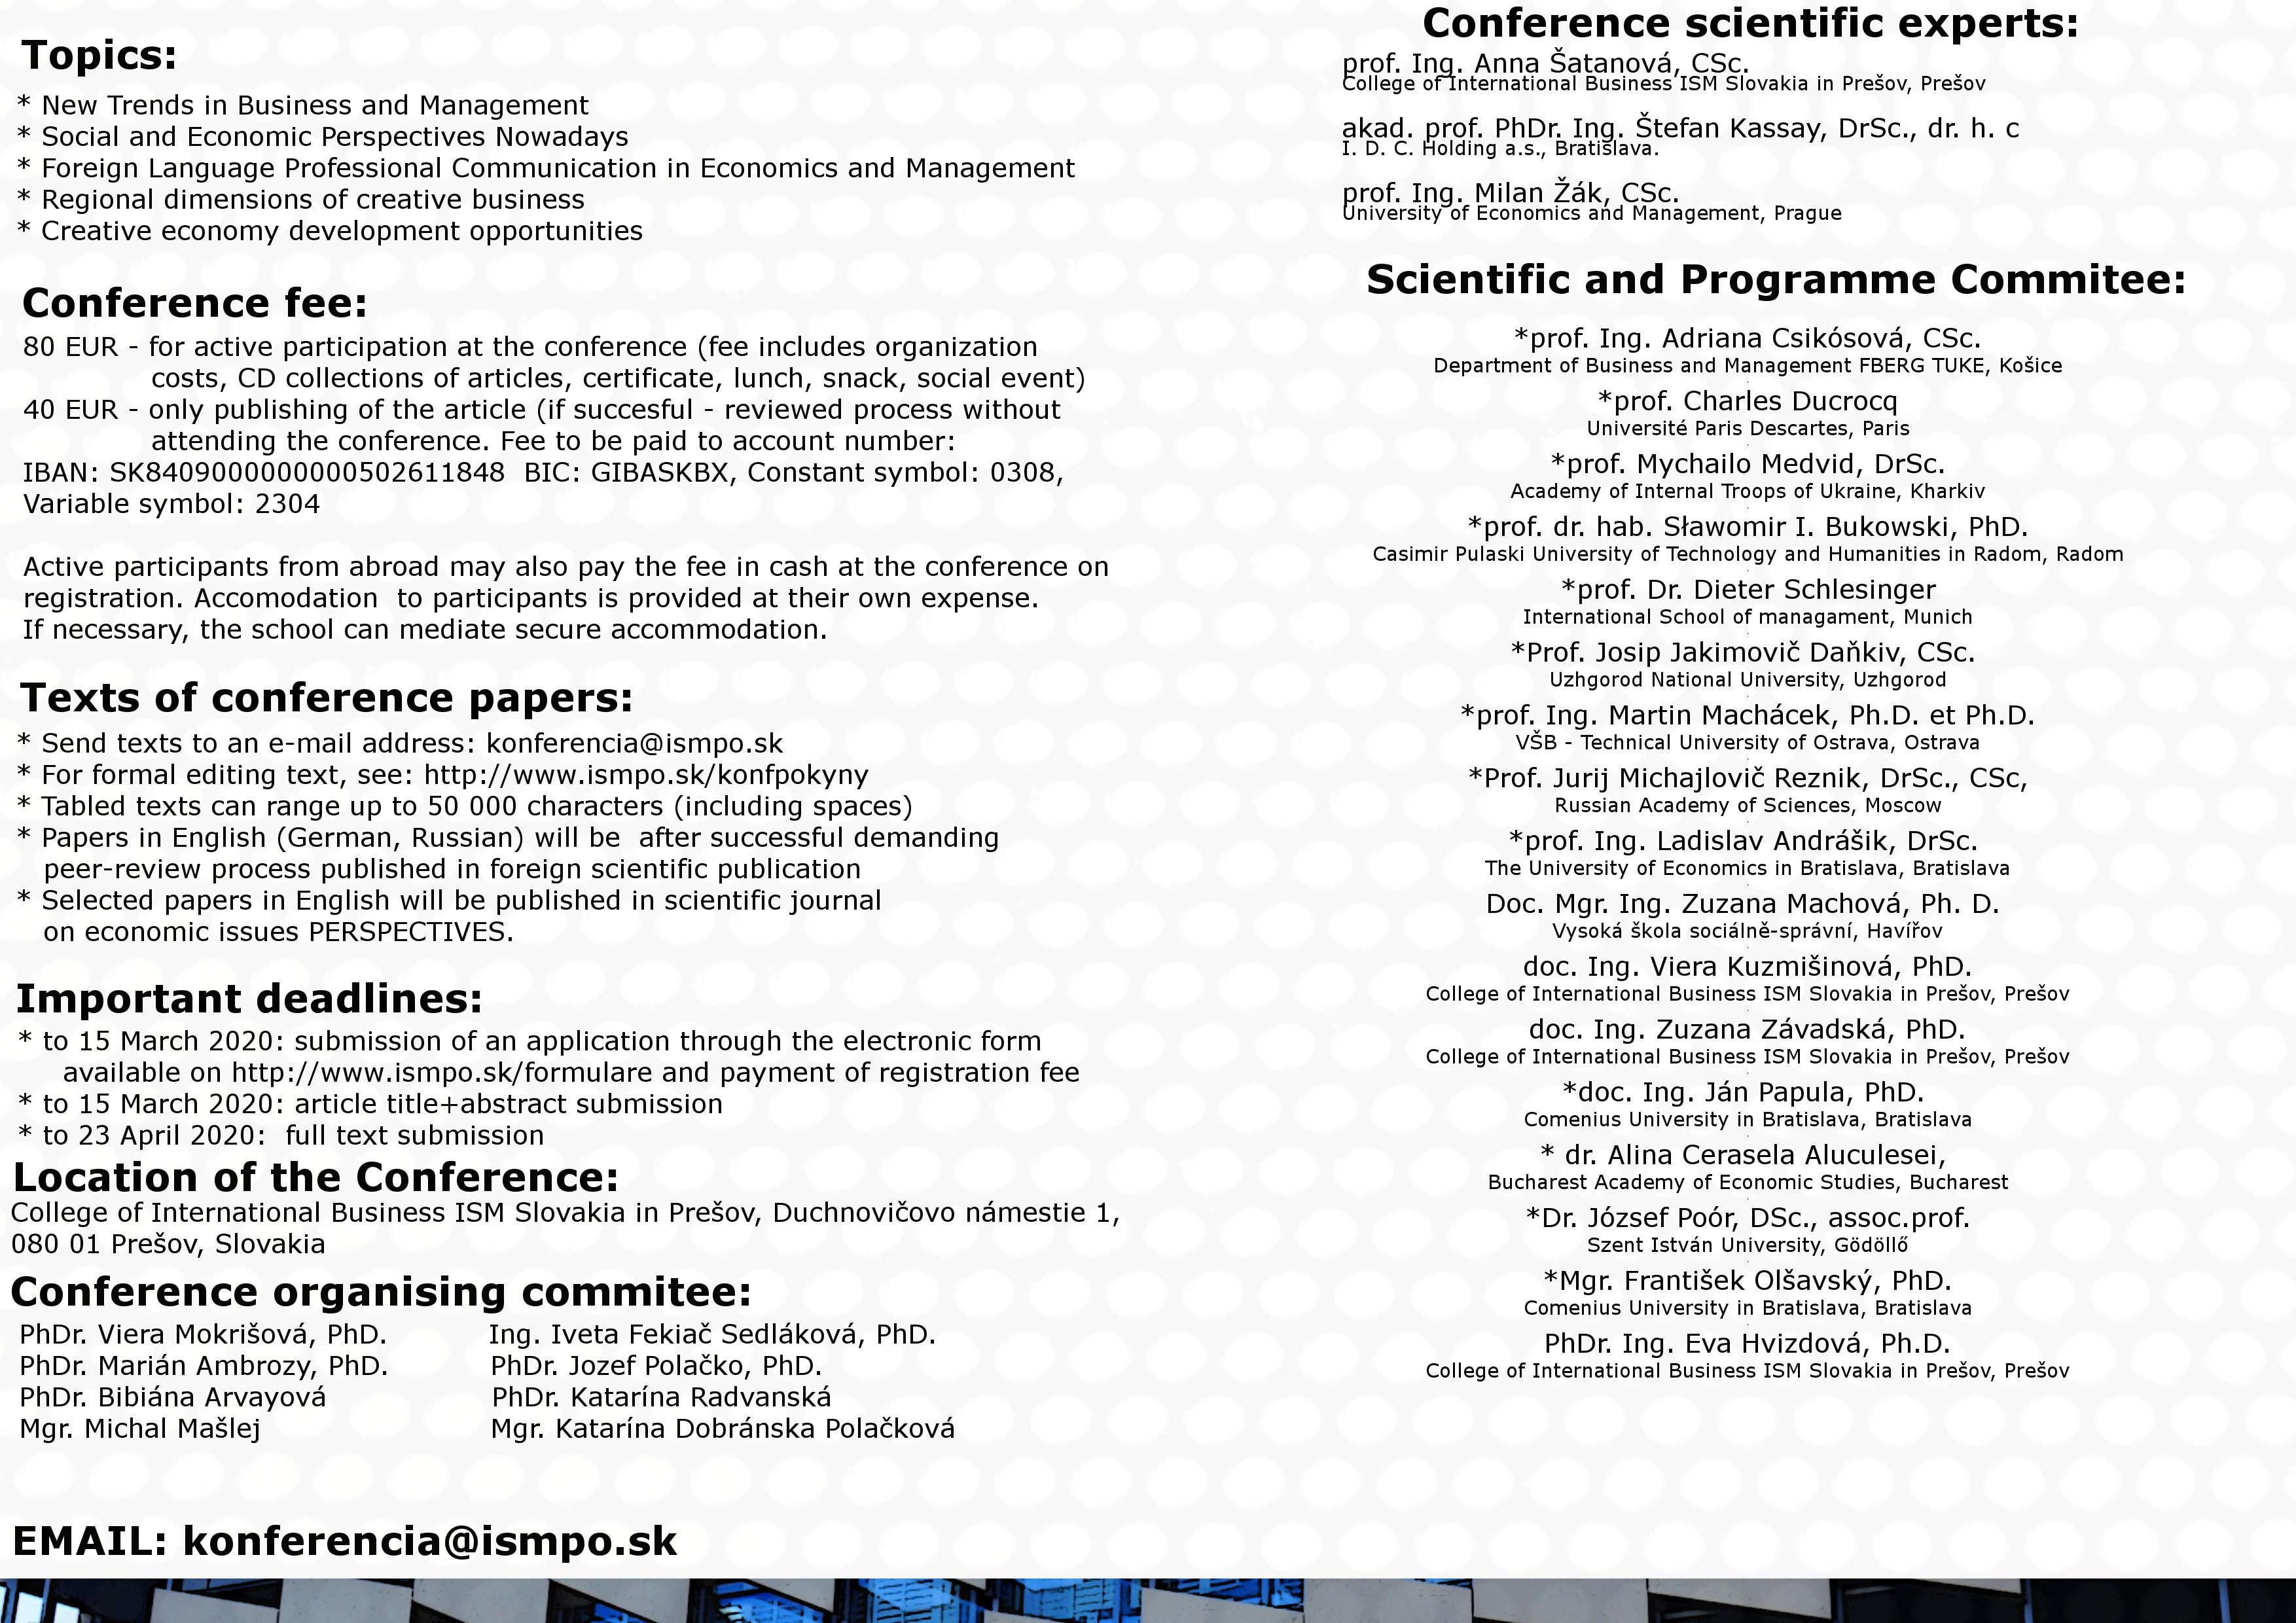 INVITATIONconferencePIPA2020b